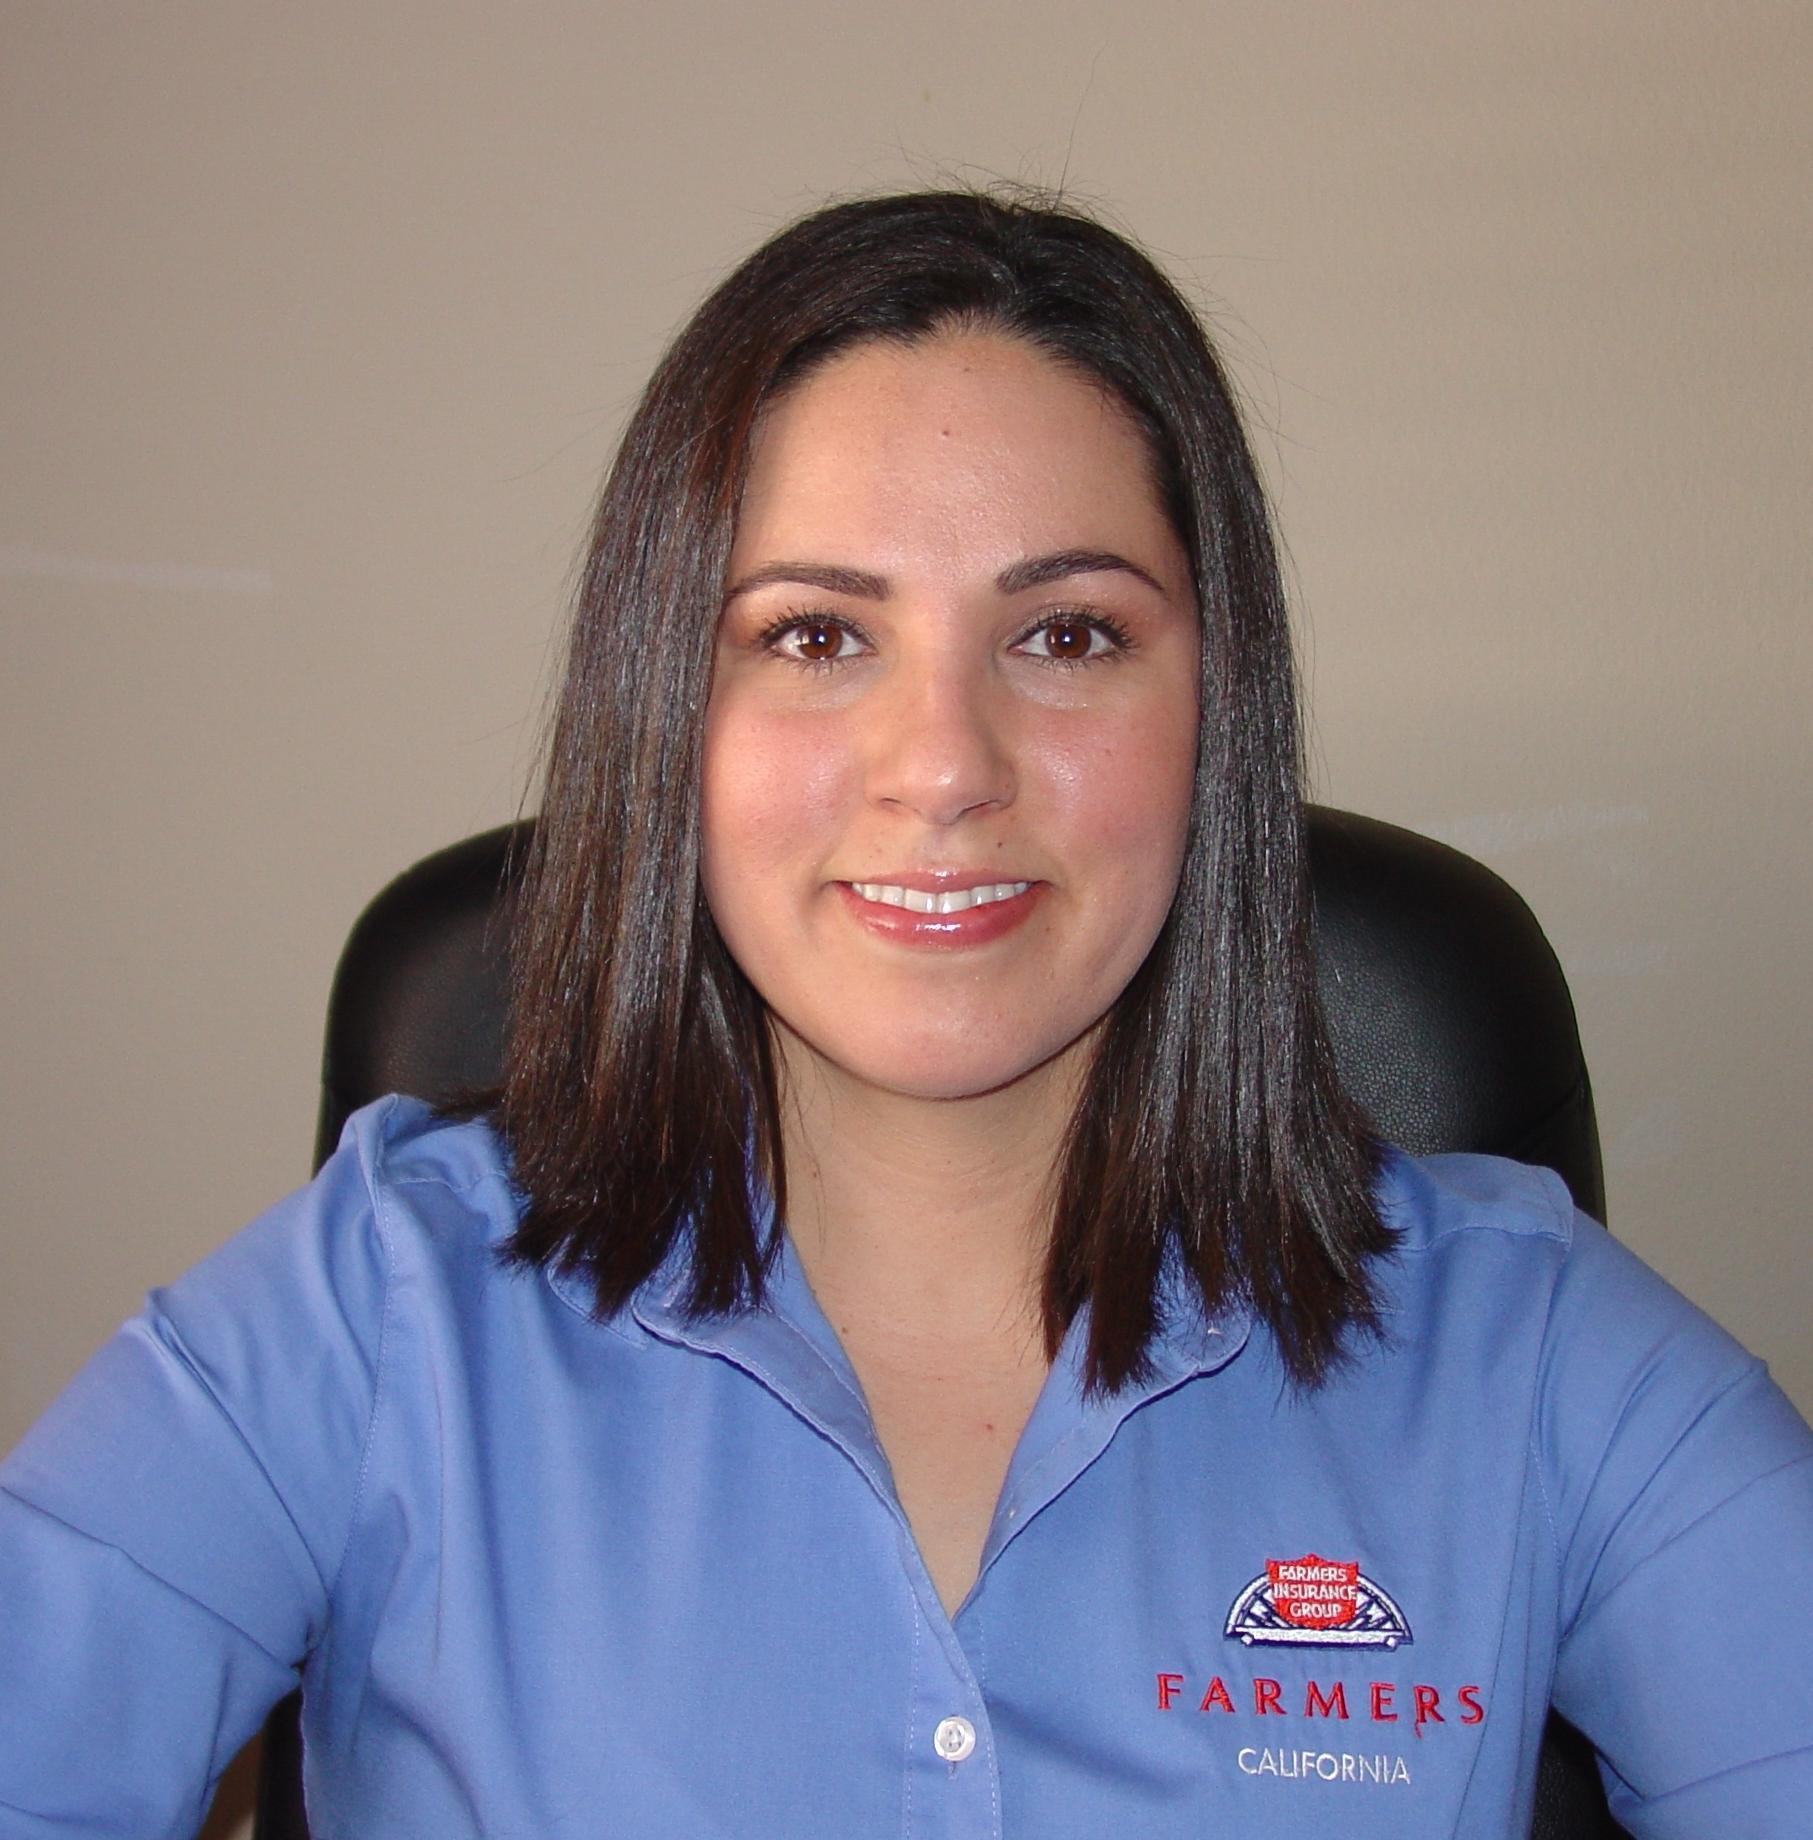 Farmers Insurance - Norma Olivares